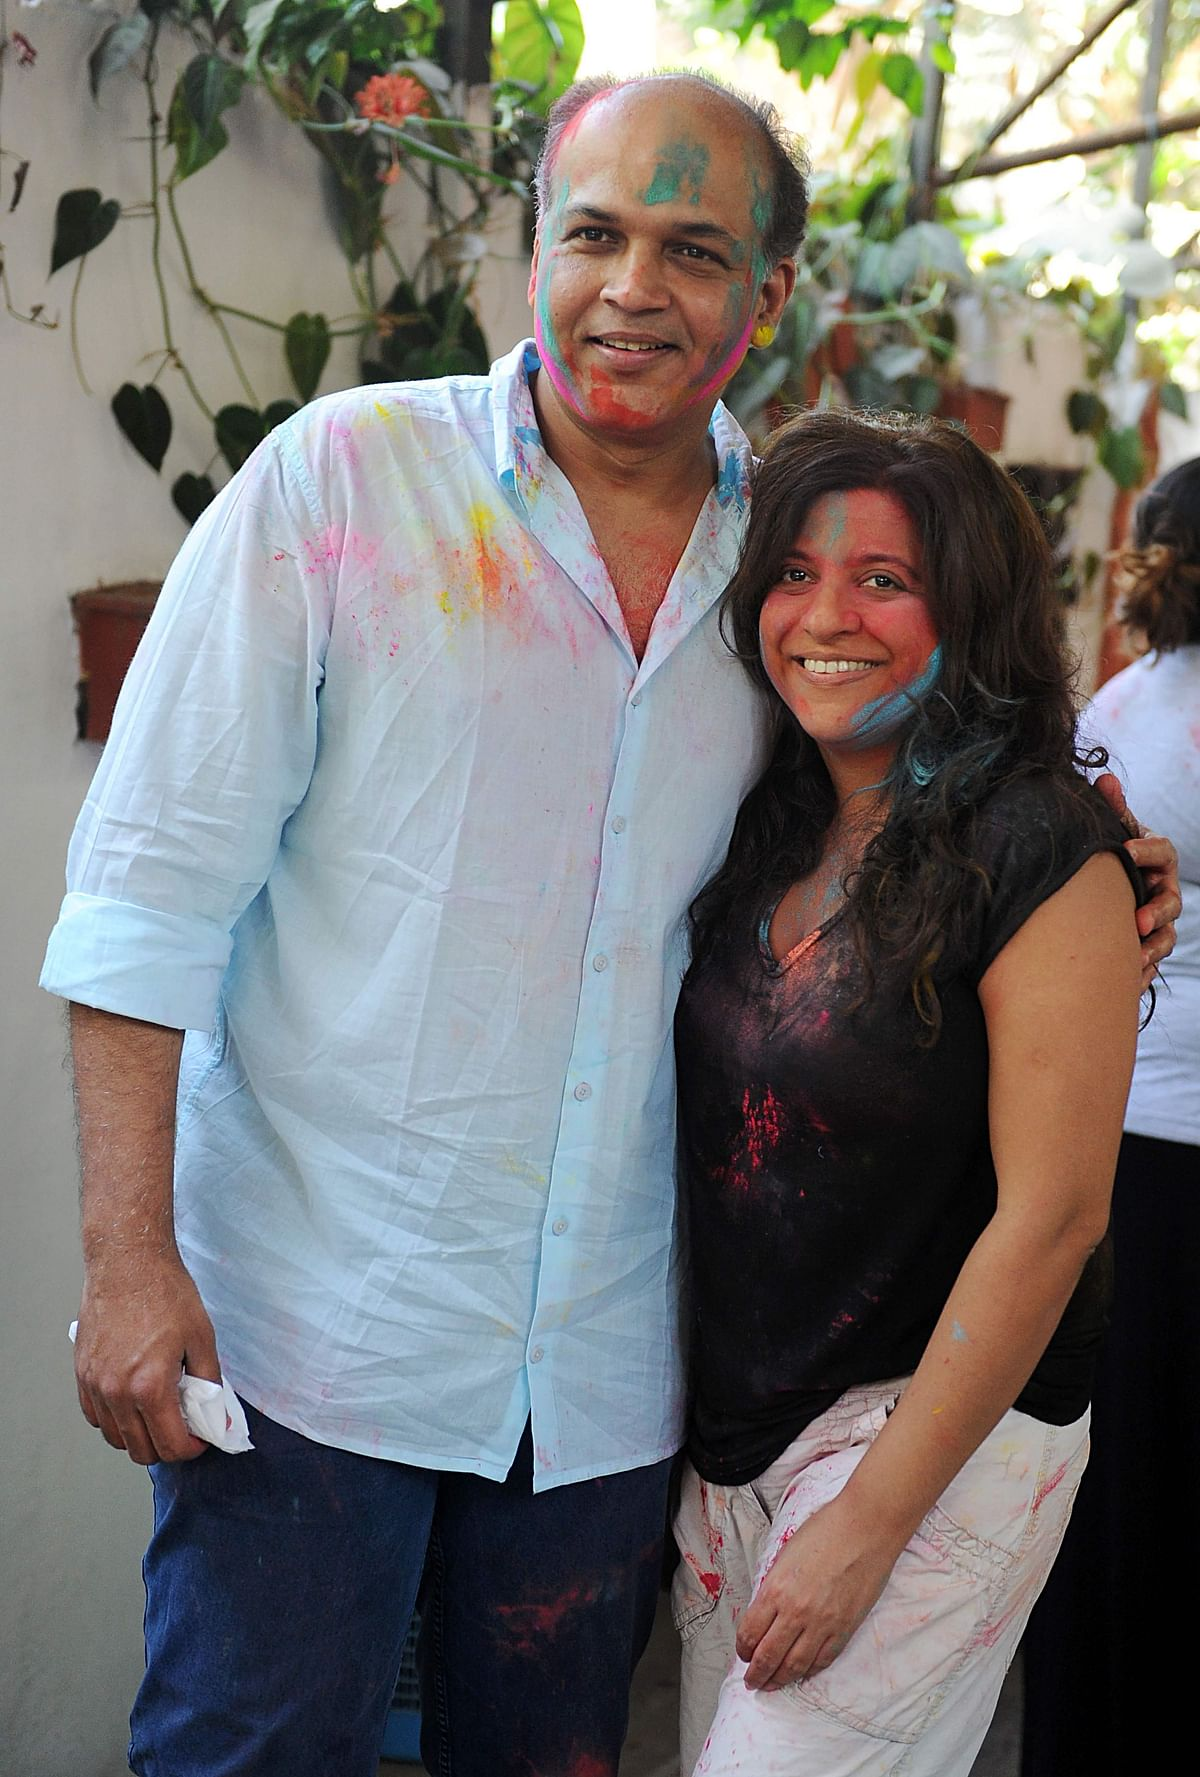 Indian Bollywood film directors Ashutosh Gowariker (L) and Zoya Akhtar (R) take part in celebrations to mark the Hindu festival of Holi in Mumbai